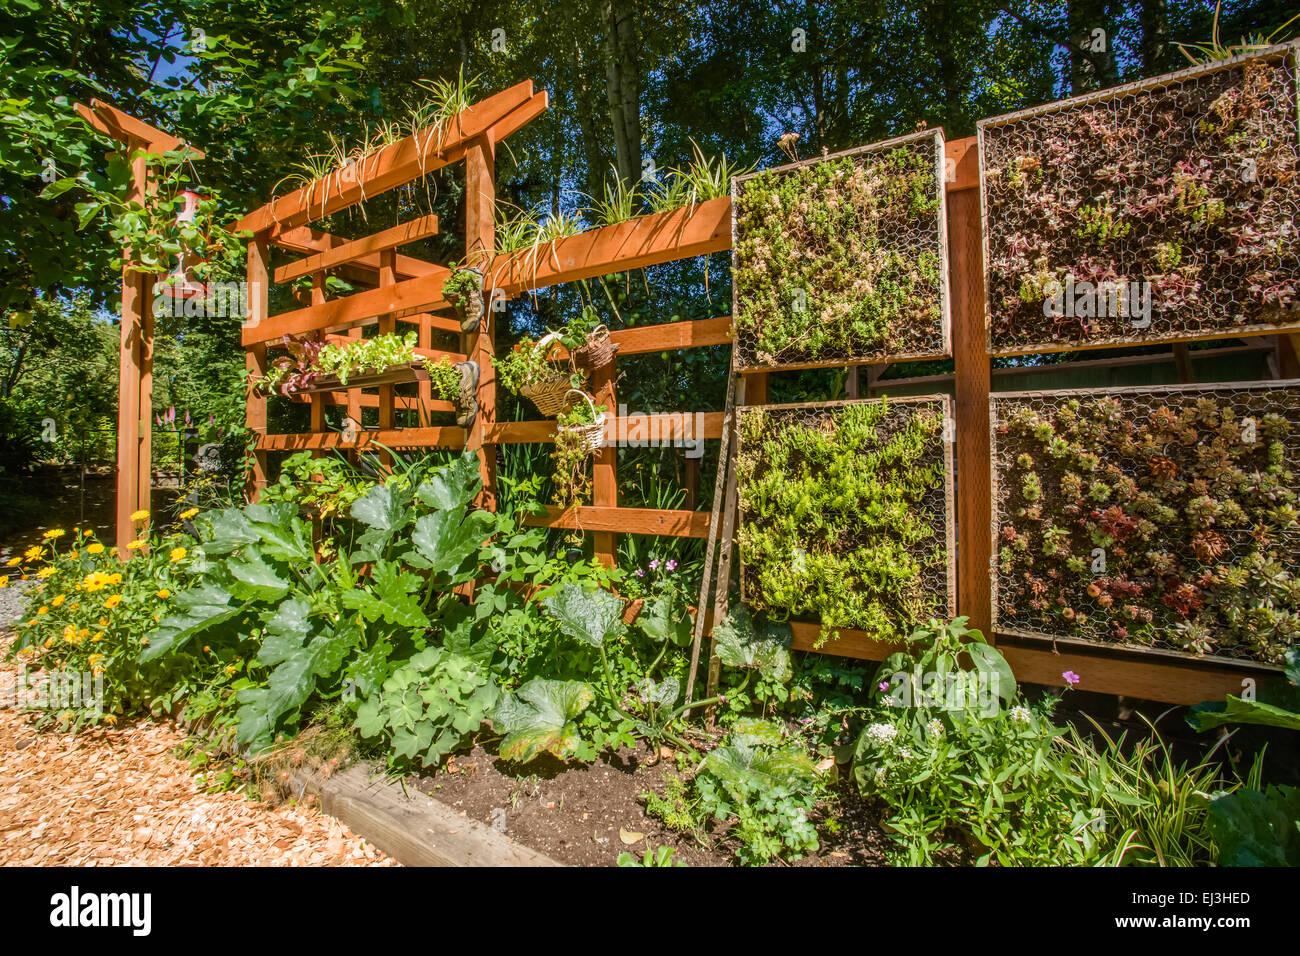 Genial Vertical Vegetable Garden Growing On A Beautiful Wooden Trellis In  Bellevue, Washington, USA